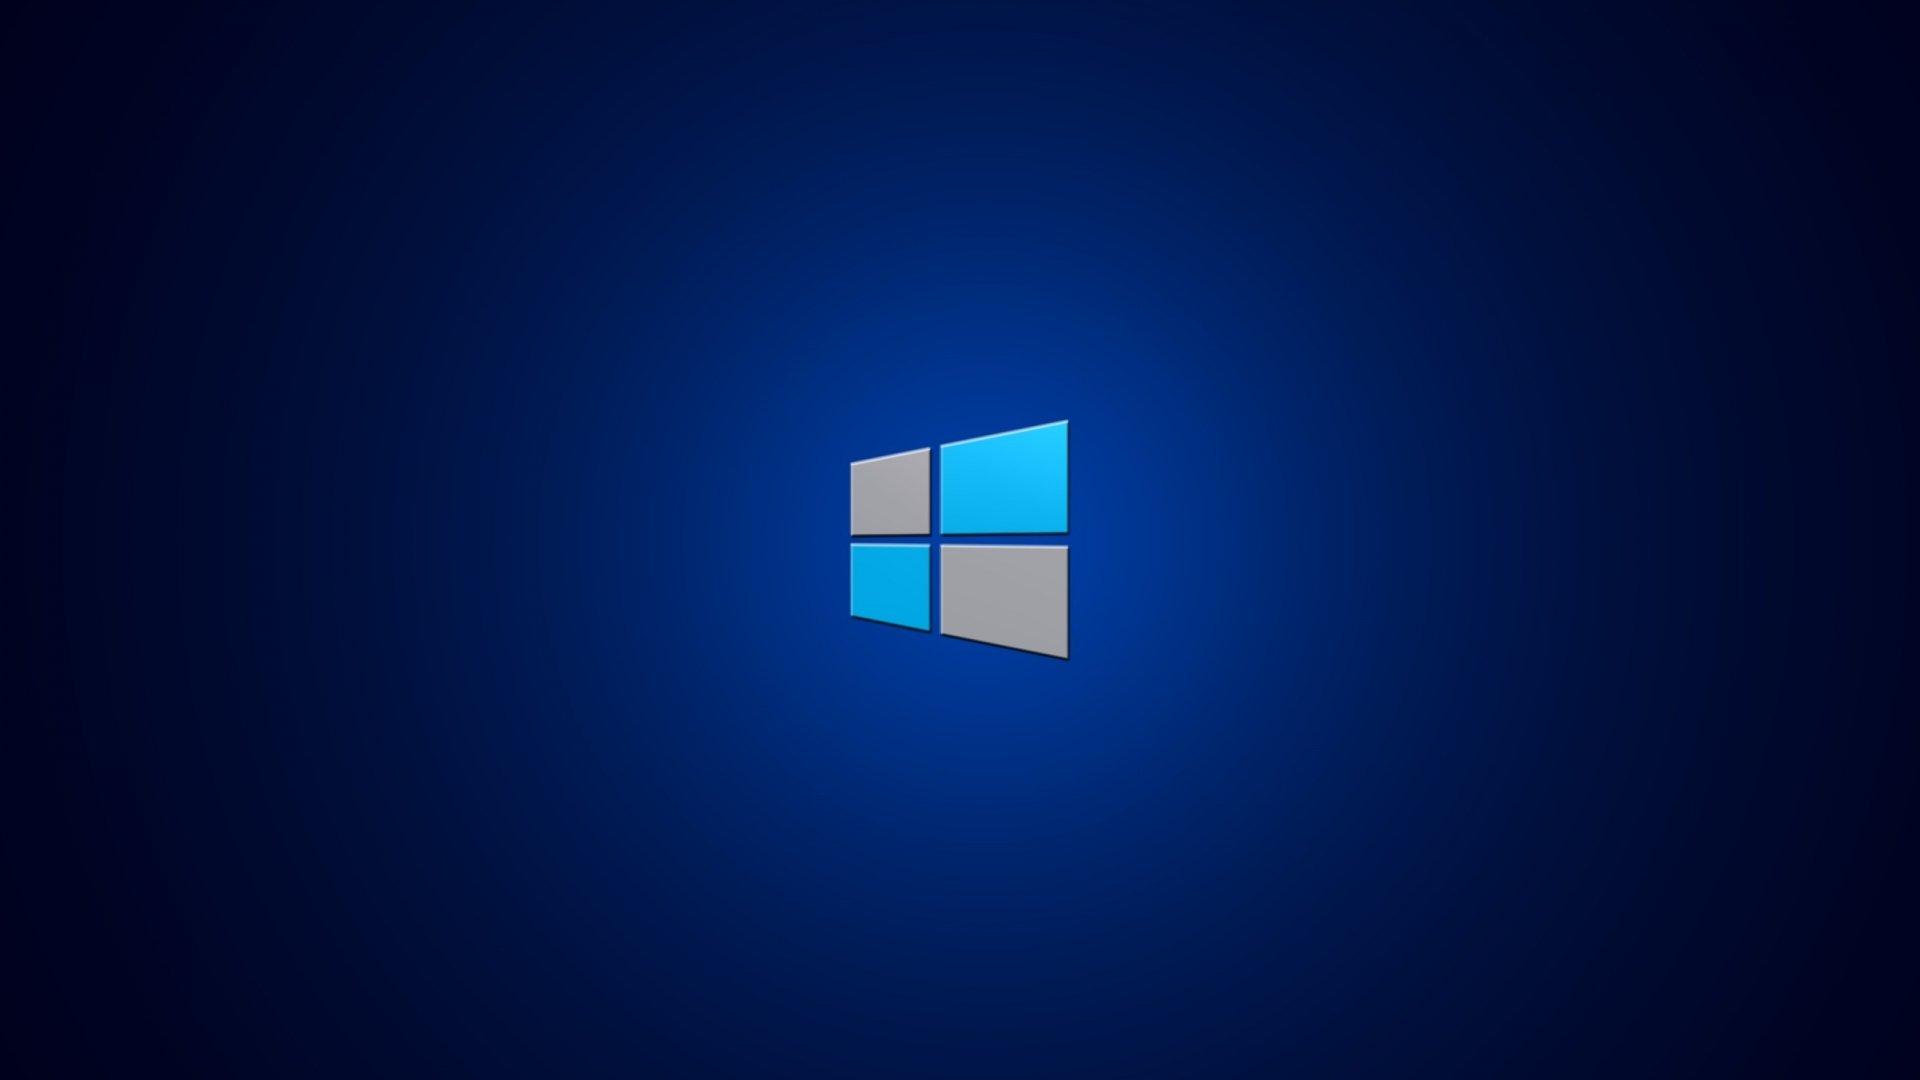 20 Widescreen HD Wallpapers For Windows 8 Desktop Background 1920x1080